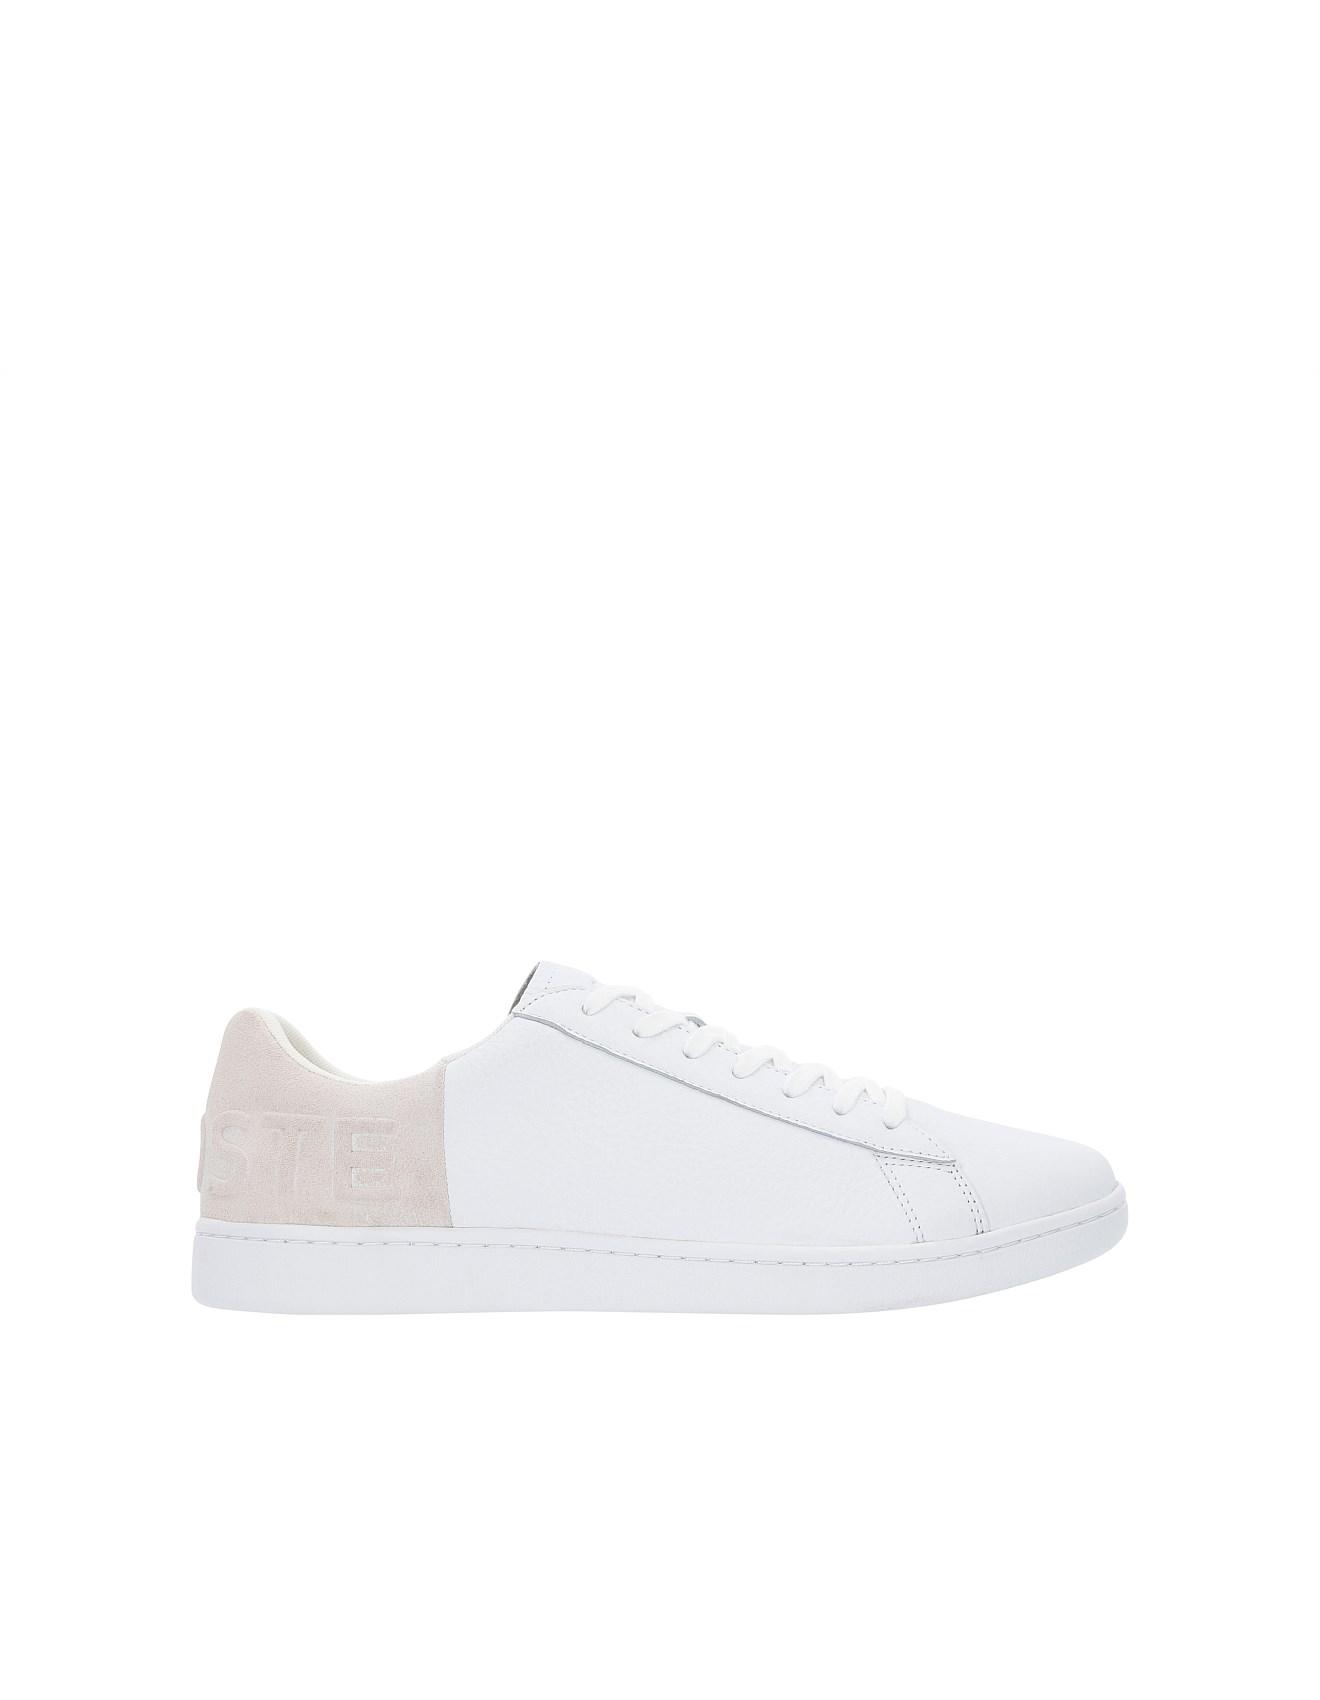 Shoes - CARNABY EVO 419 2 SMA SMA WHT